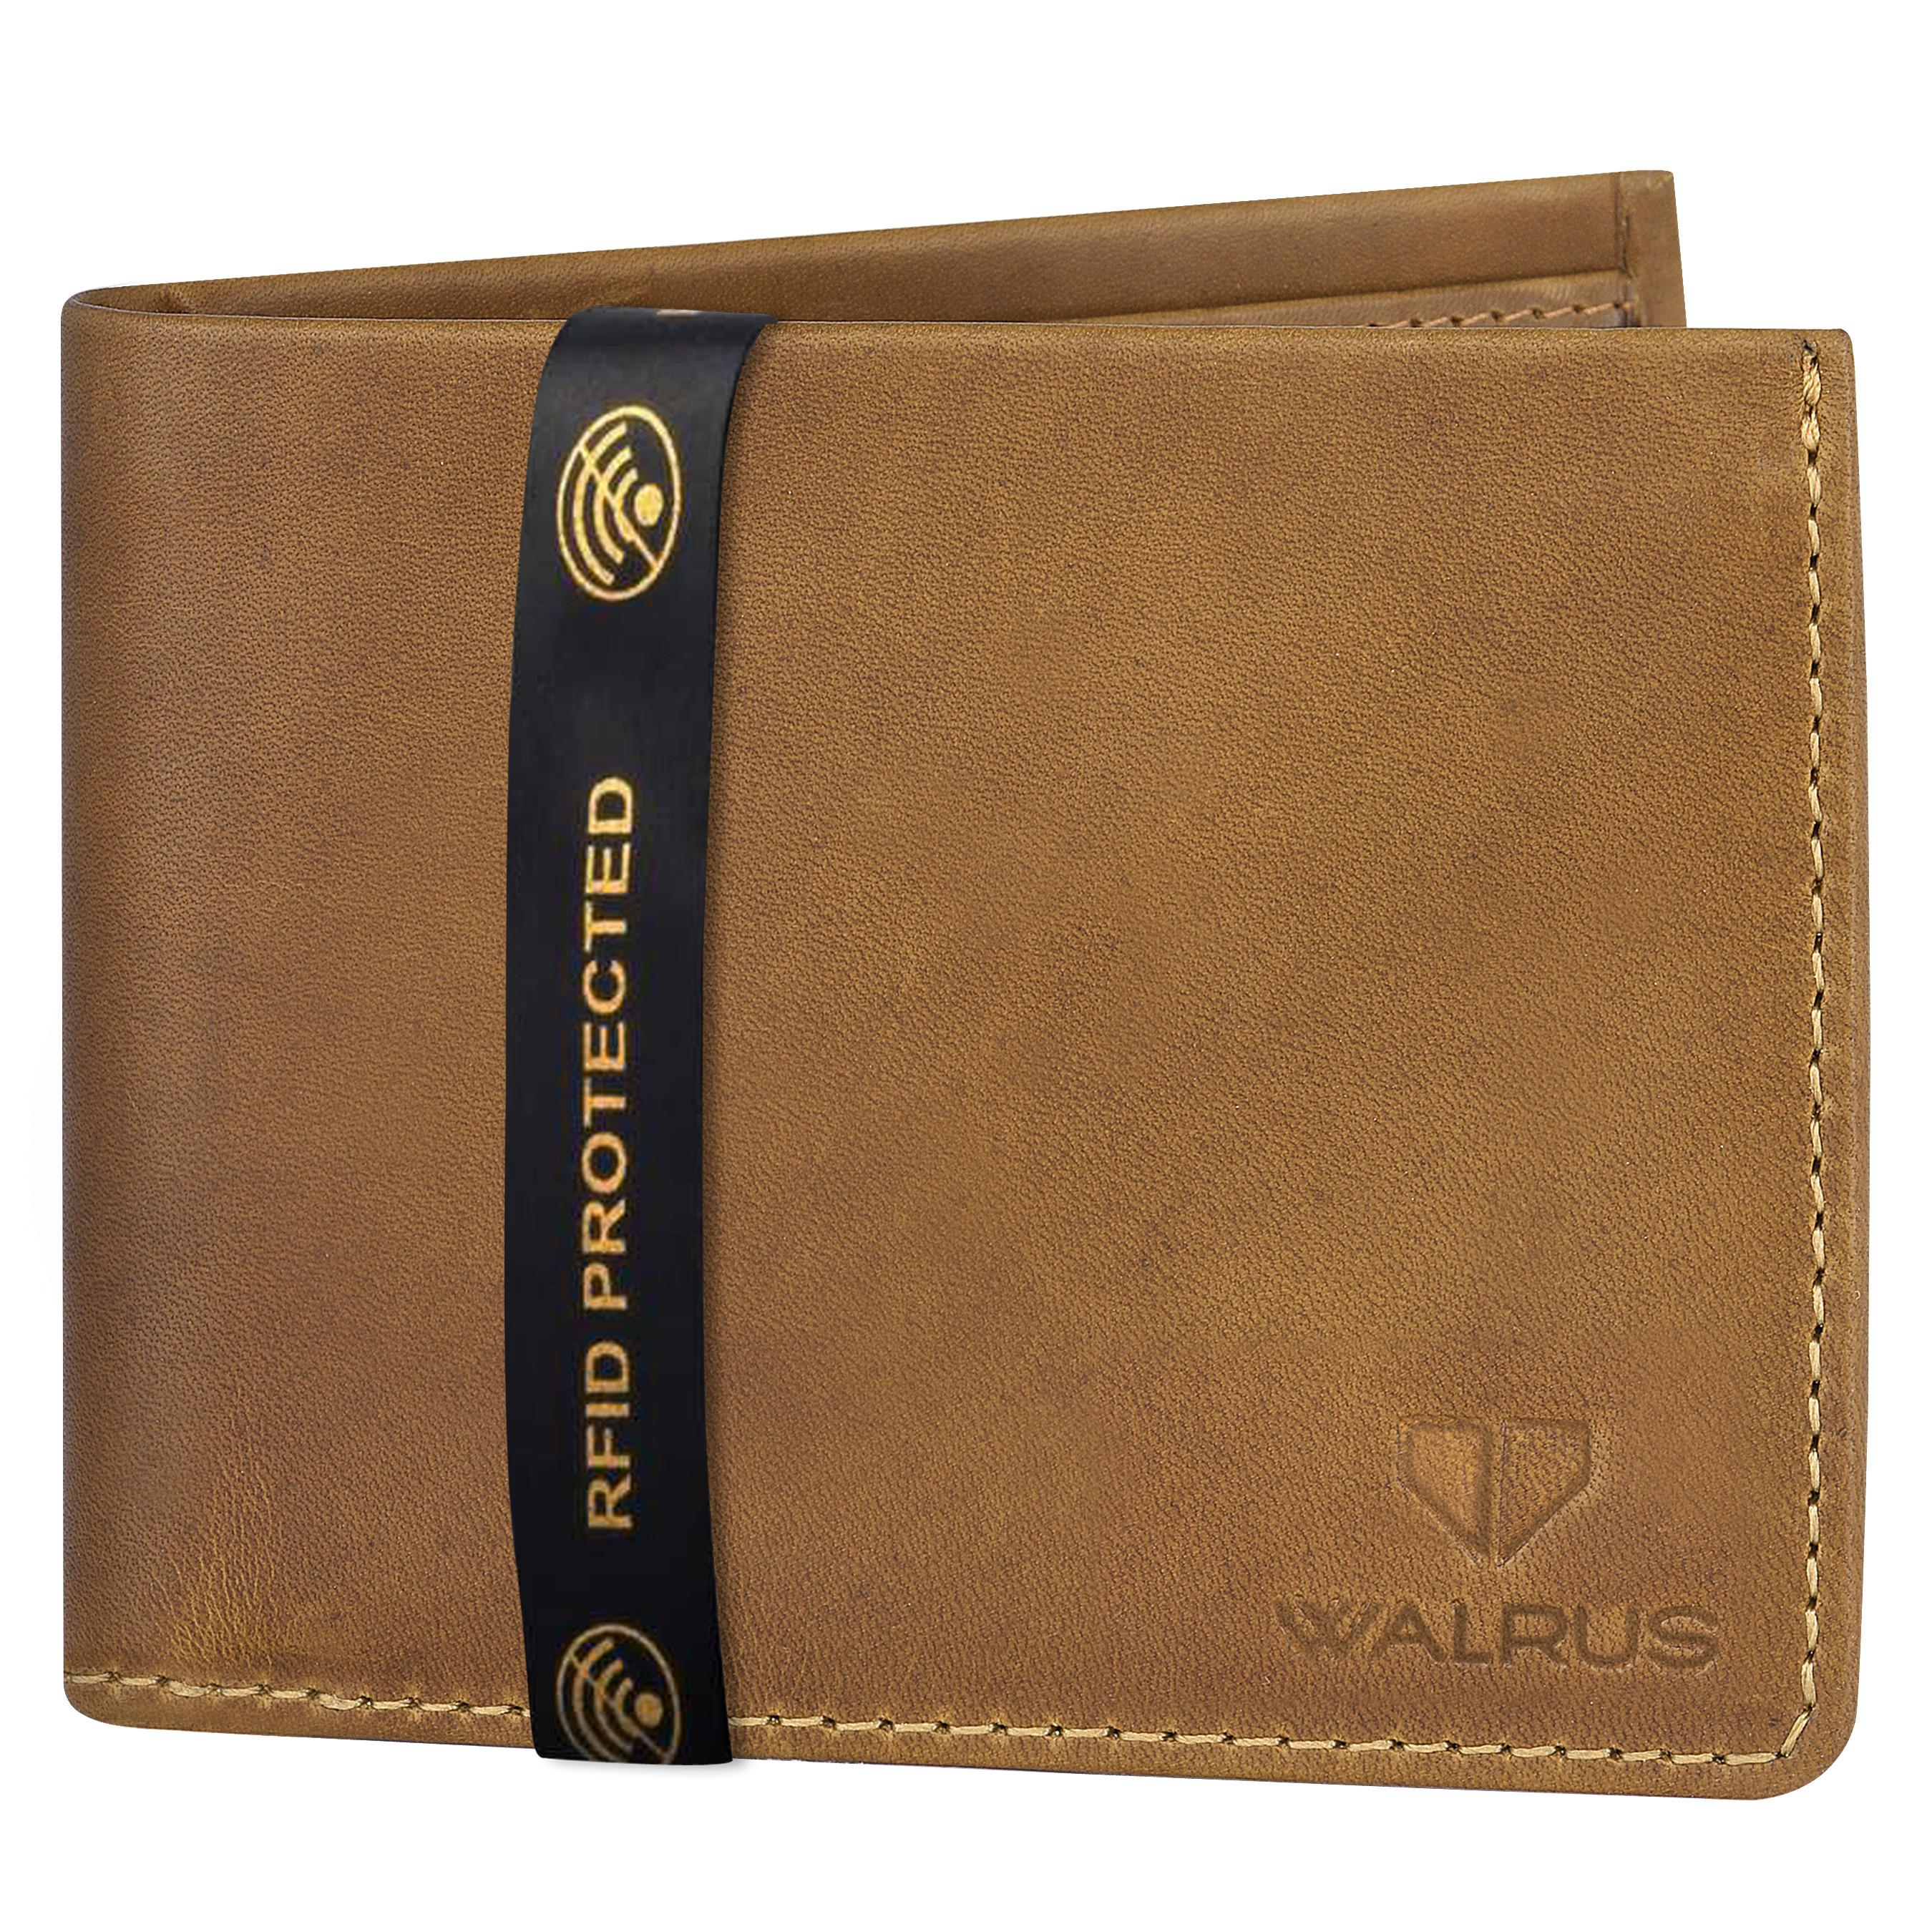 Walrus | Walrus Elite VIII Beige Premium Genuine Leather Men Wallet With RFID Protection.